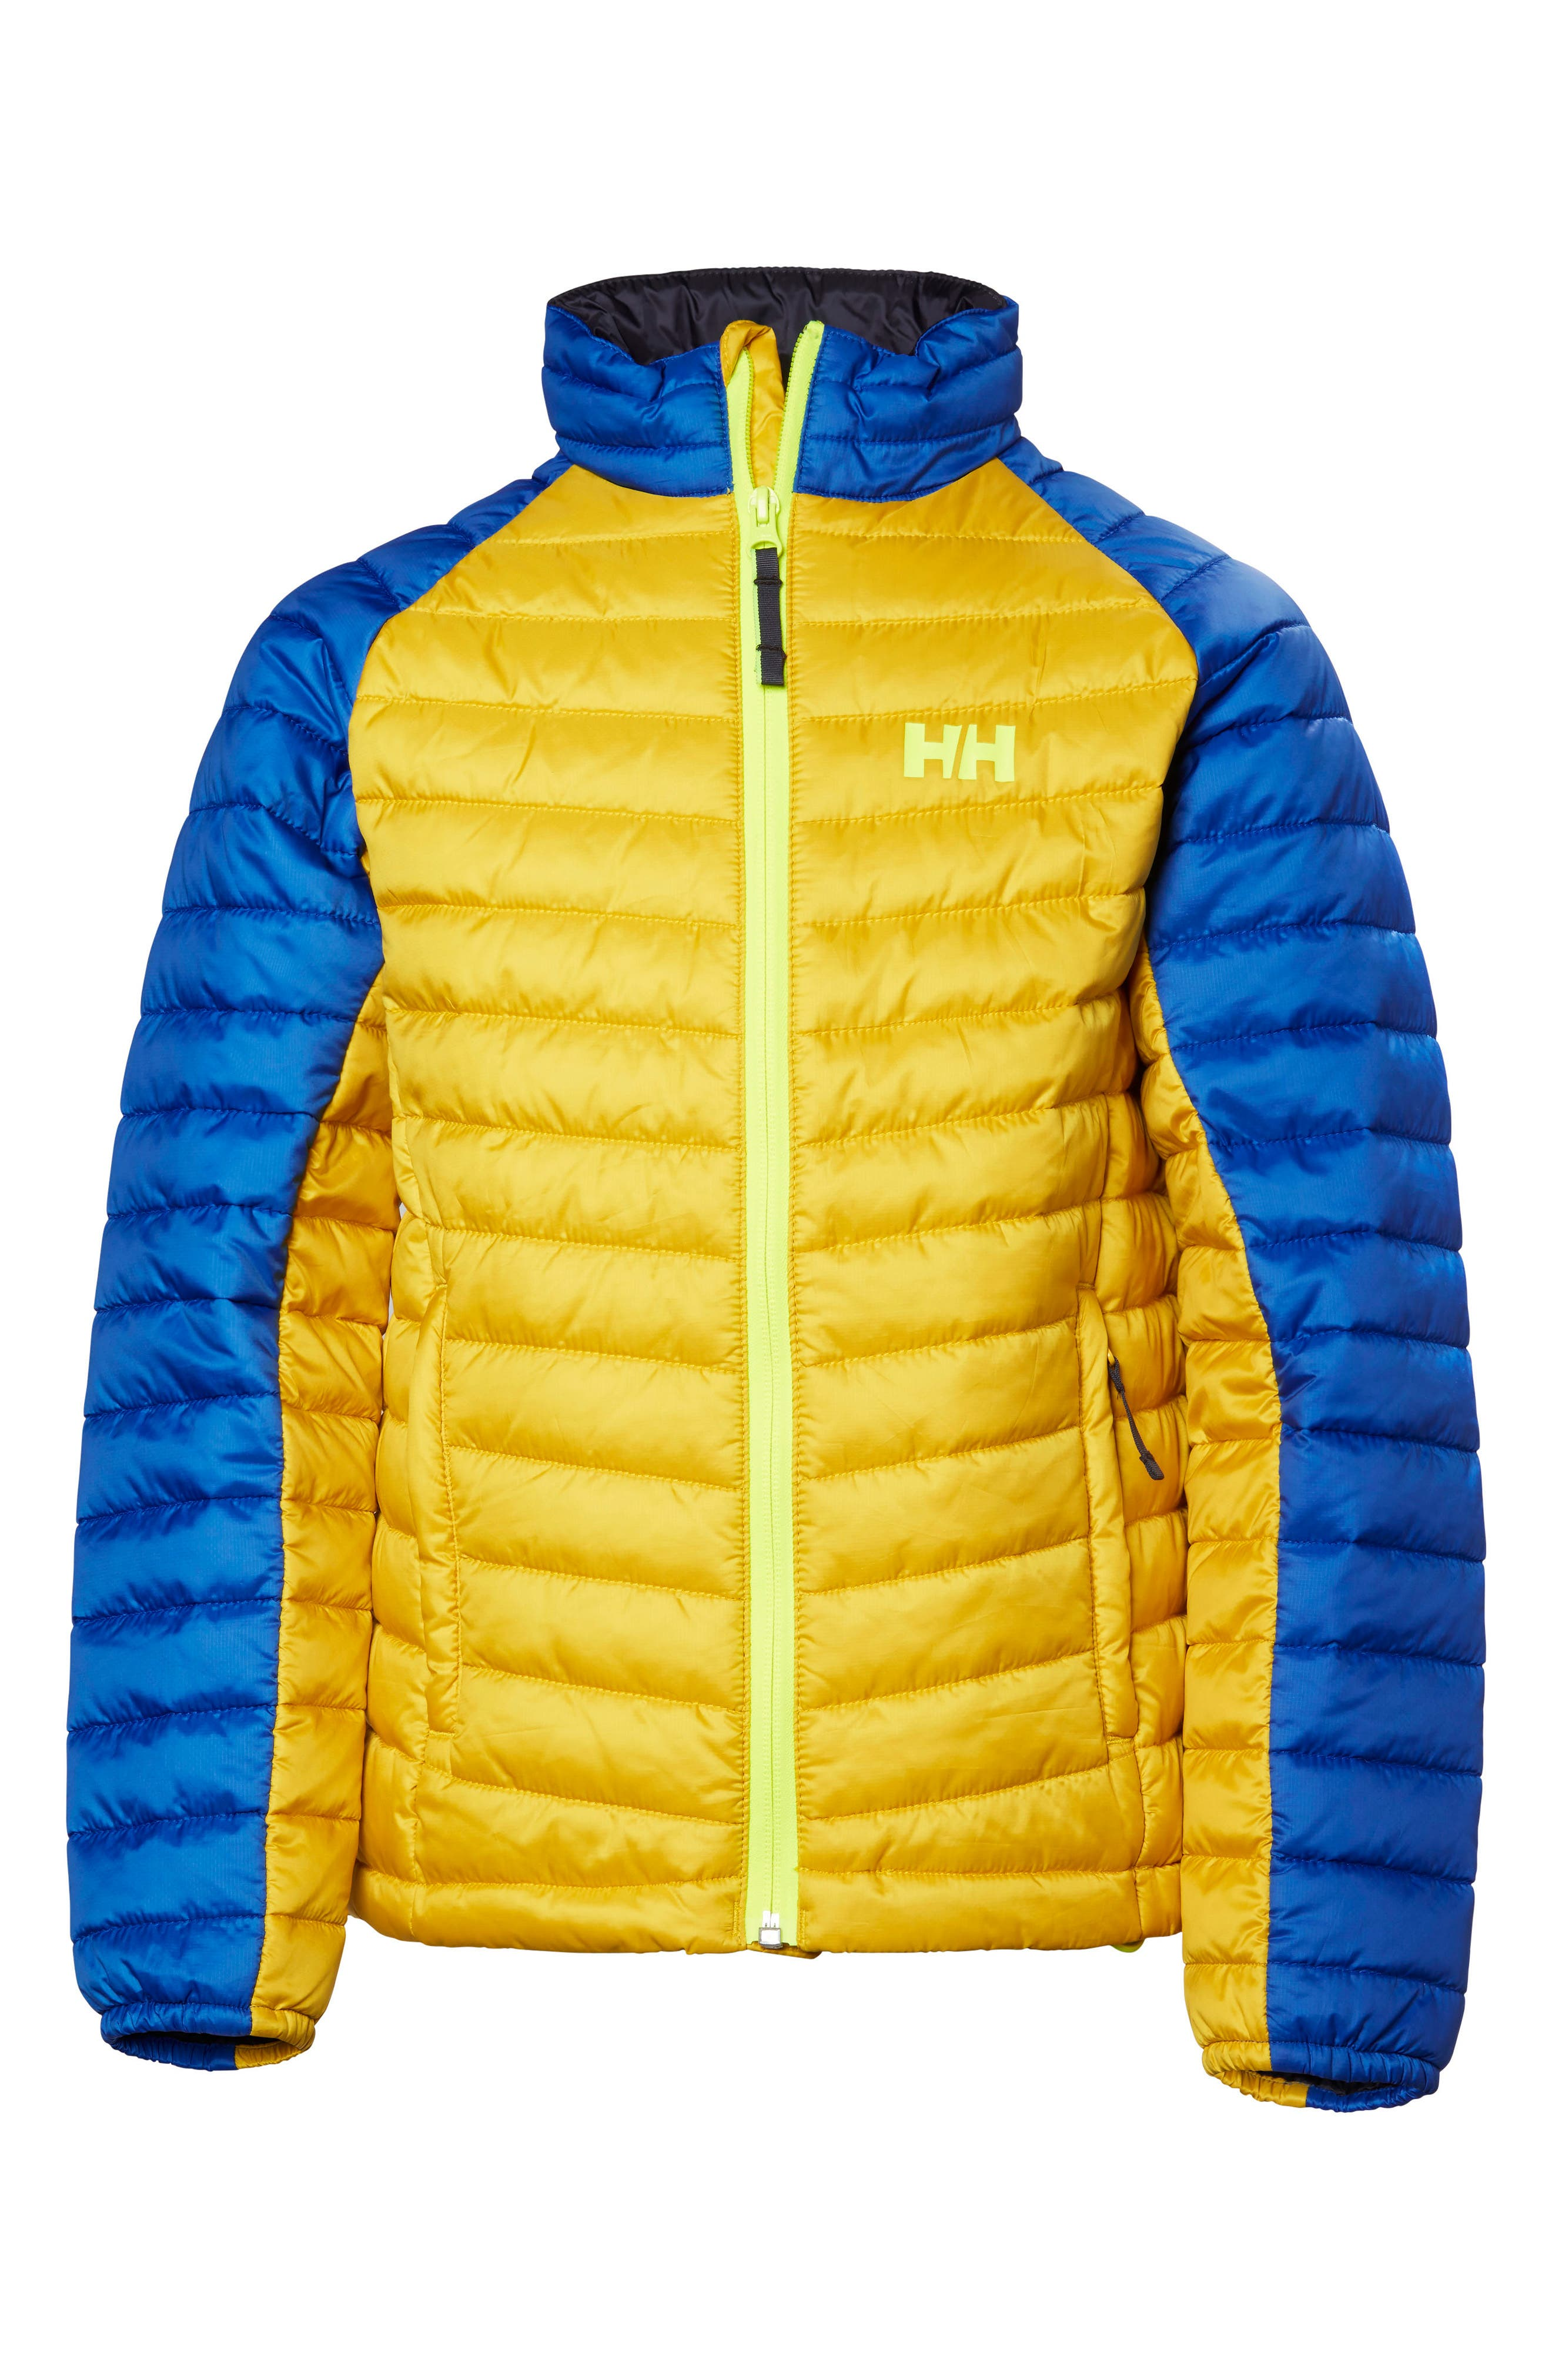 Alternate Image 1 Selected - Helly Hansen Jr Juell Insulator Water Repellent Jacket (Big Boys)